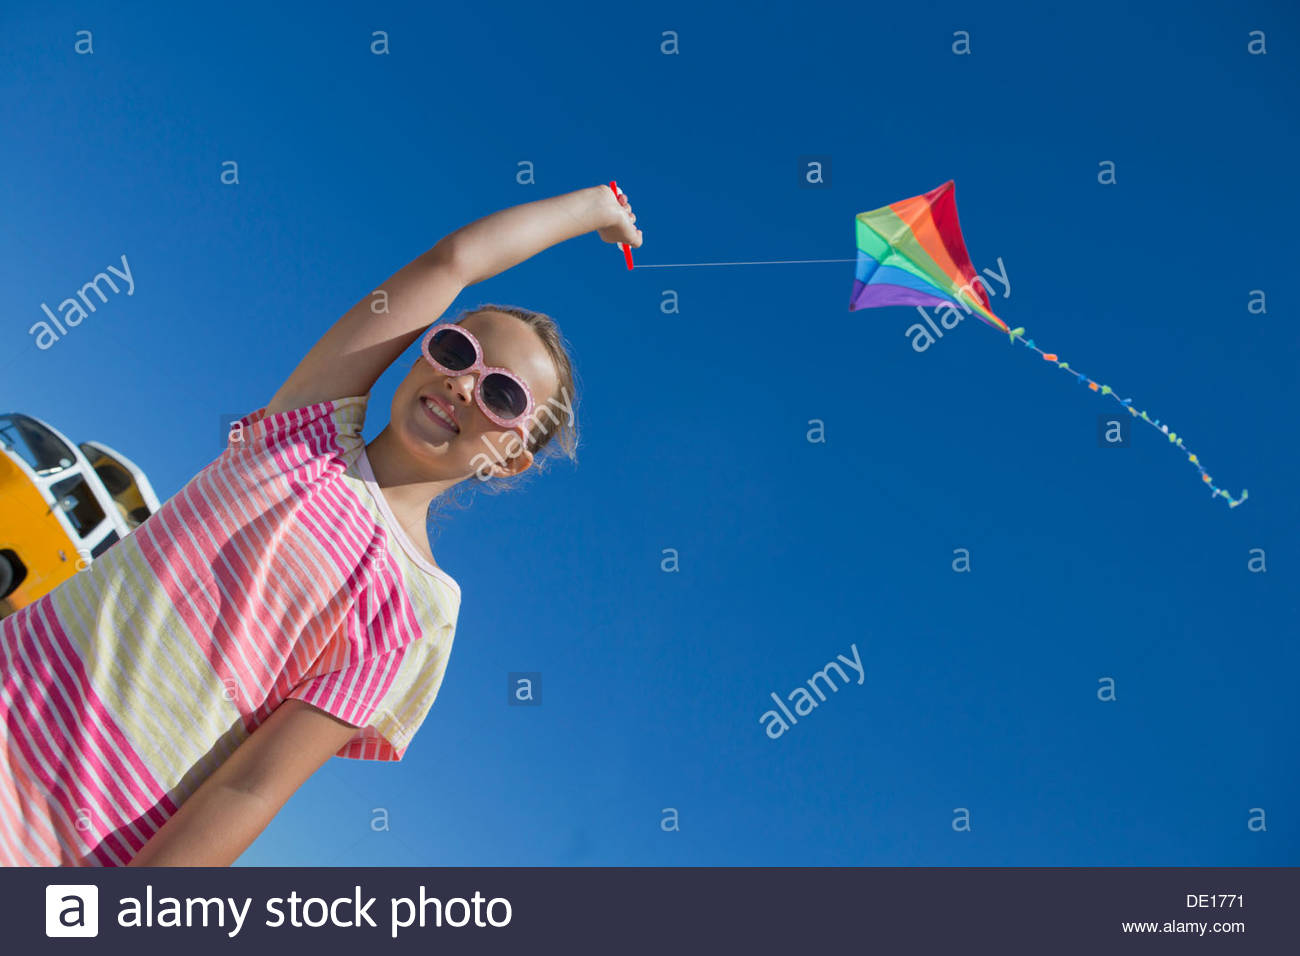 Chica volar cometa contra el cielo azul Imagen De Stock